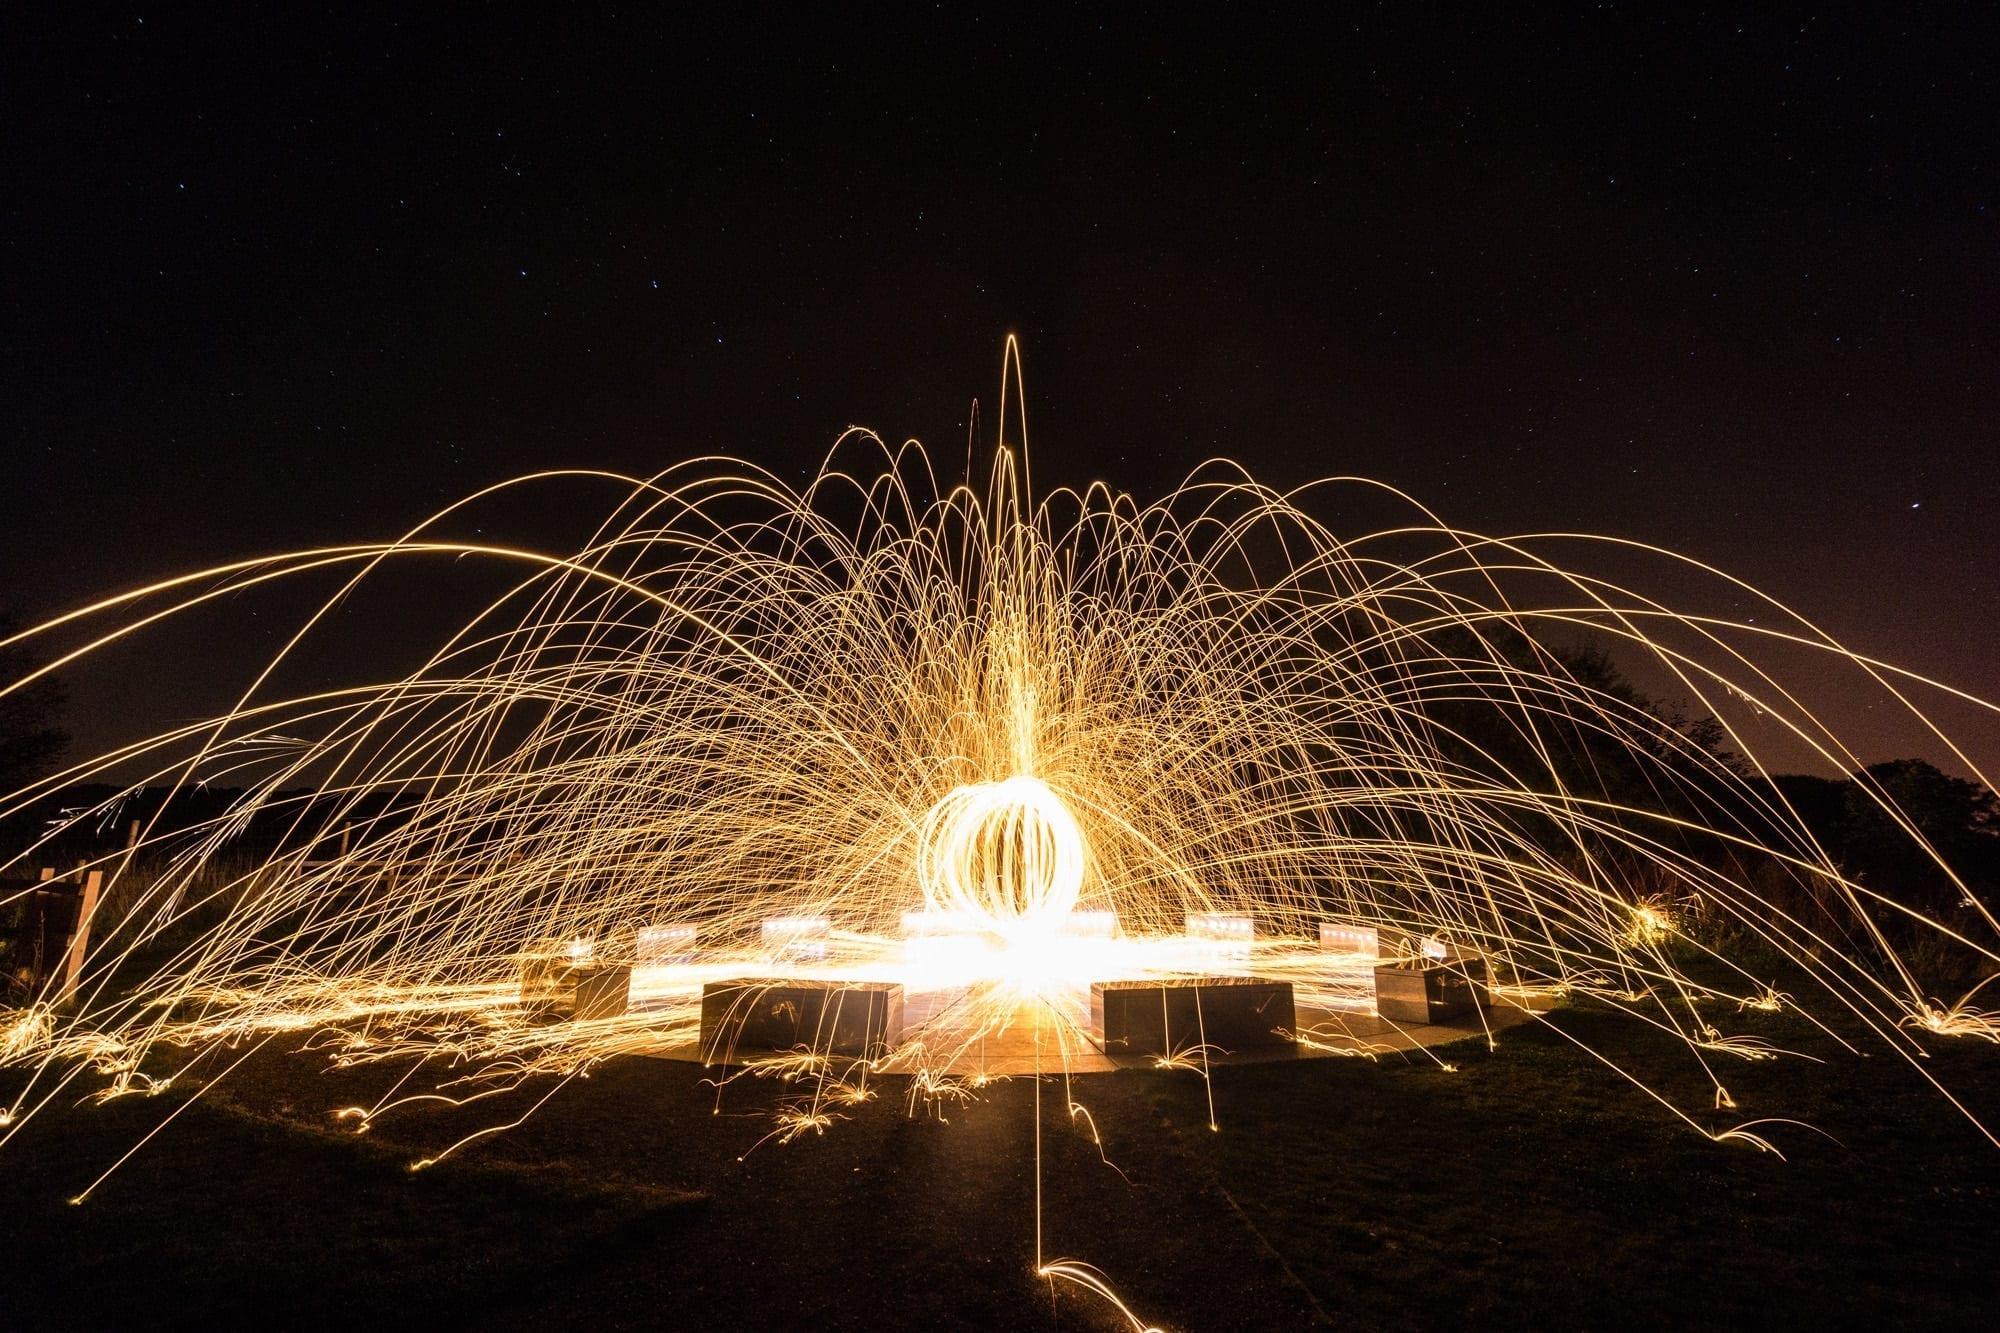 Wirksworth Star Disc Fireball  - Peak District Photography